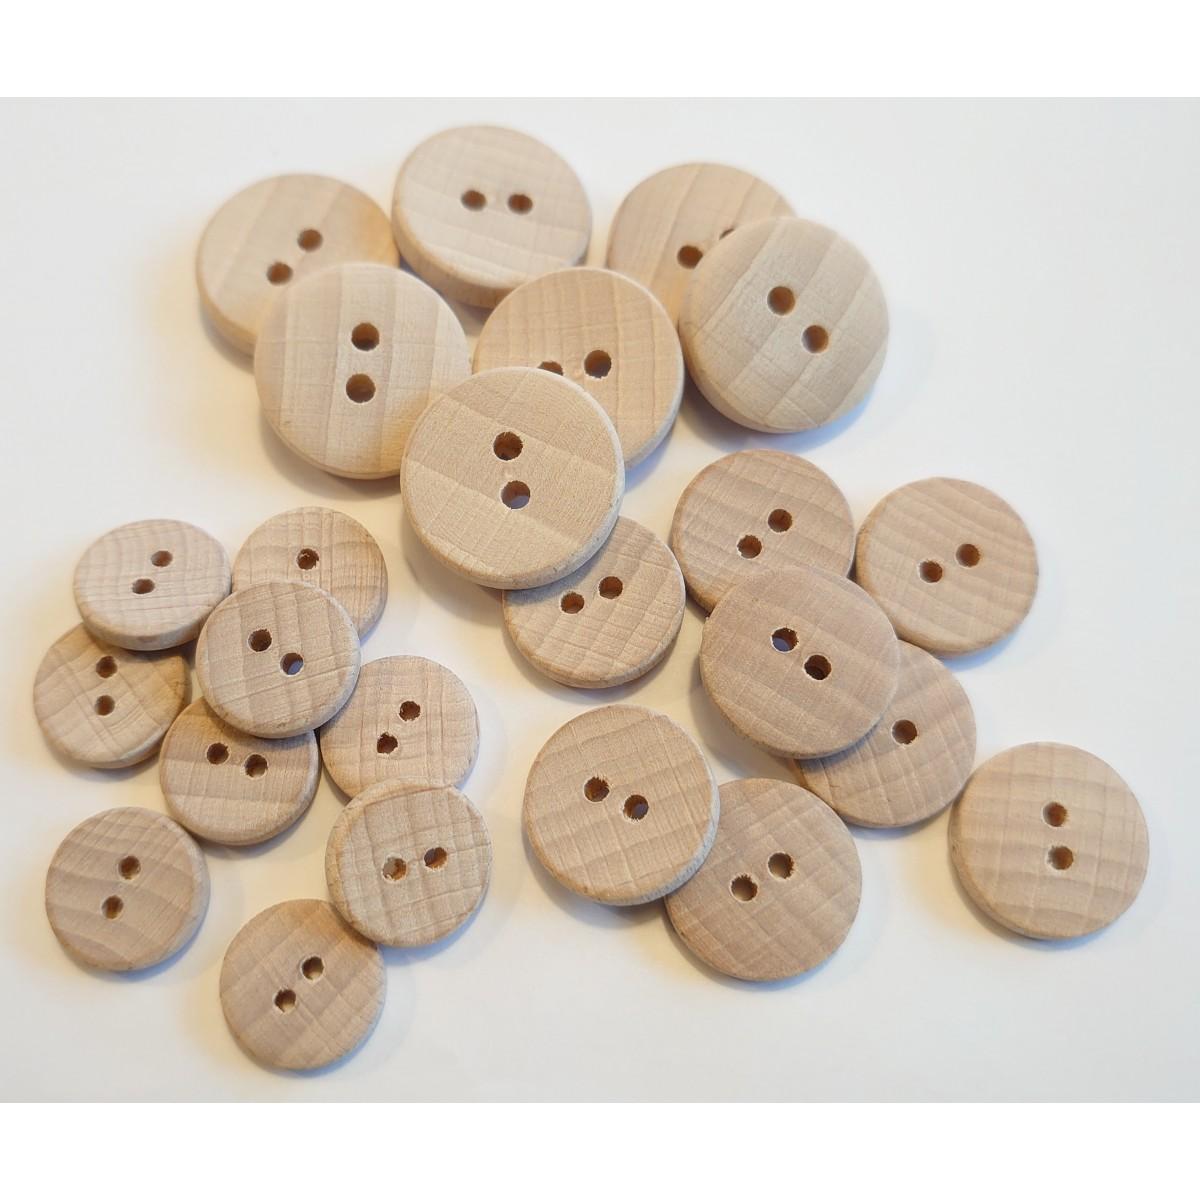 knapper i træ